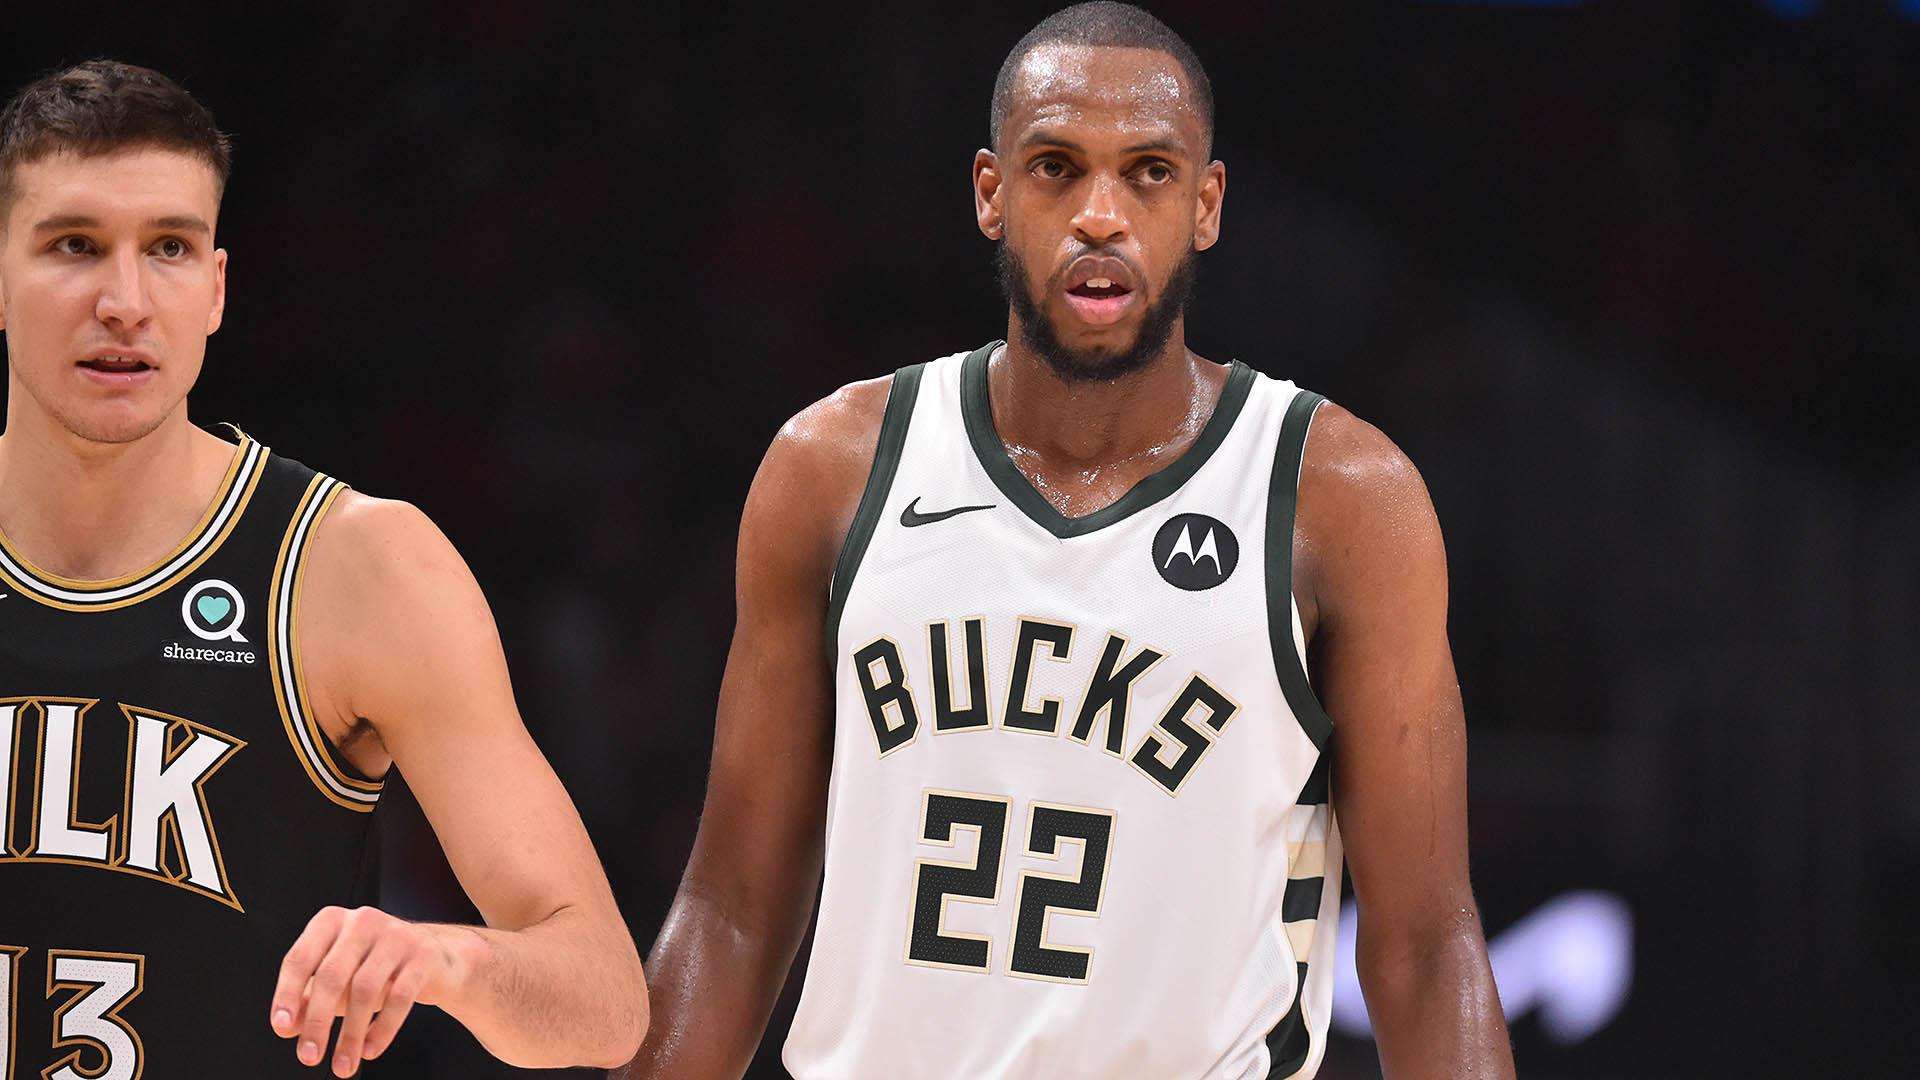 How will Bucks adjust in Game 5 of East finals?